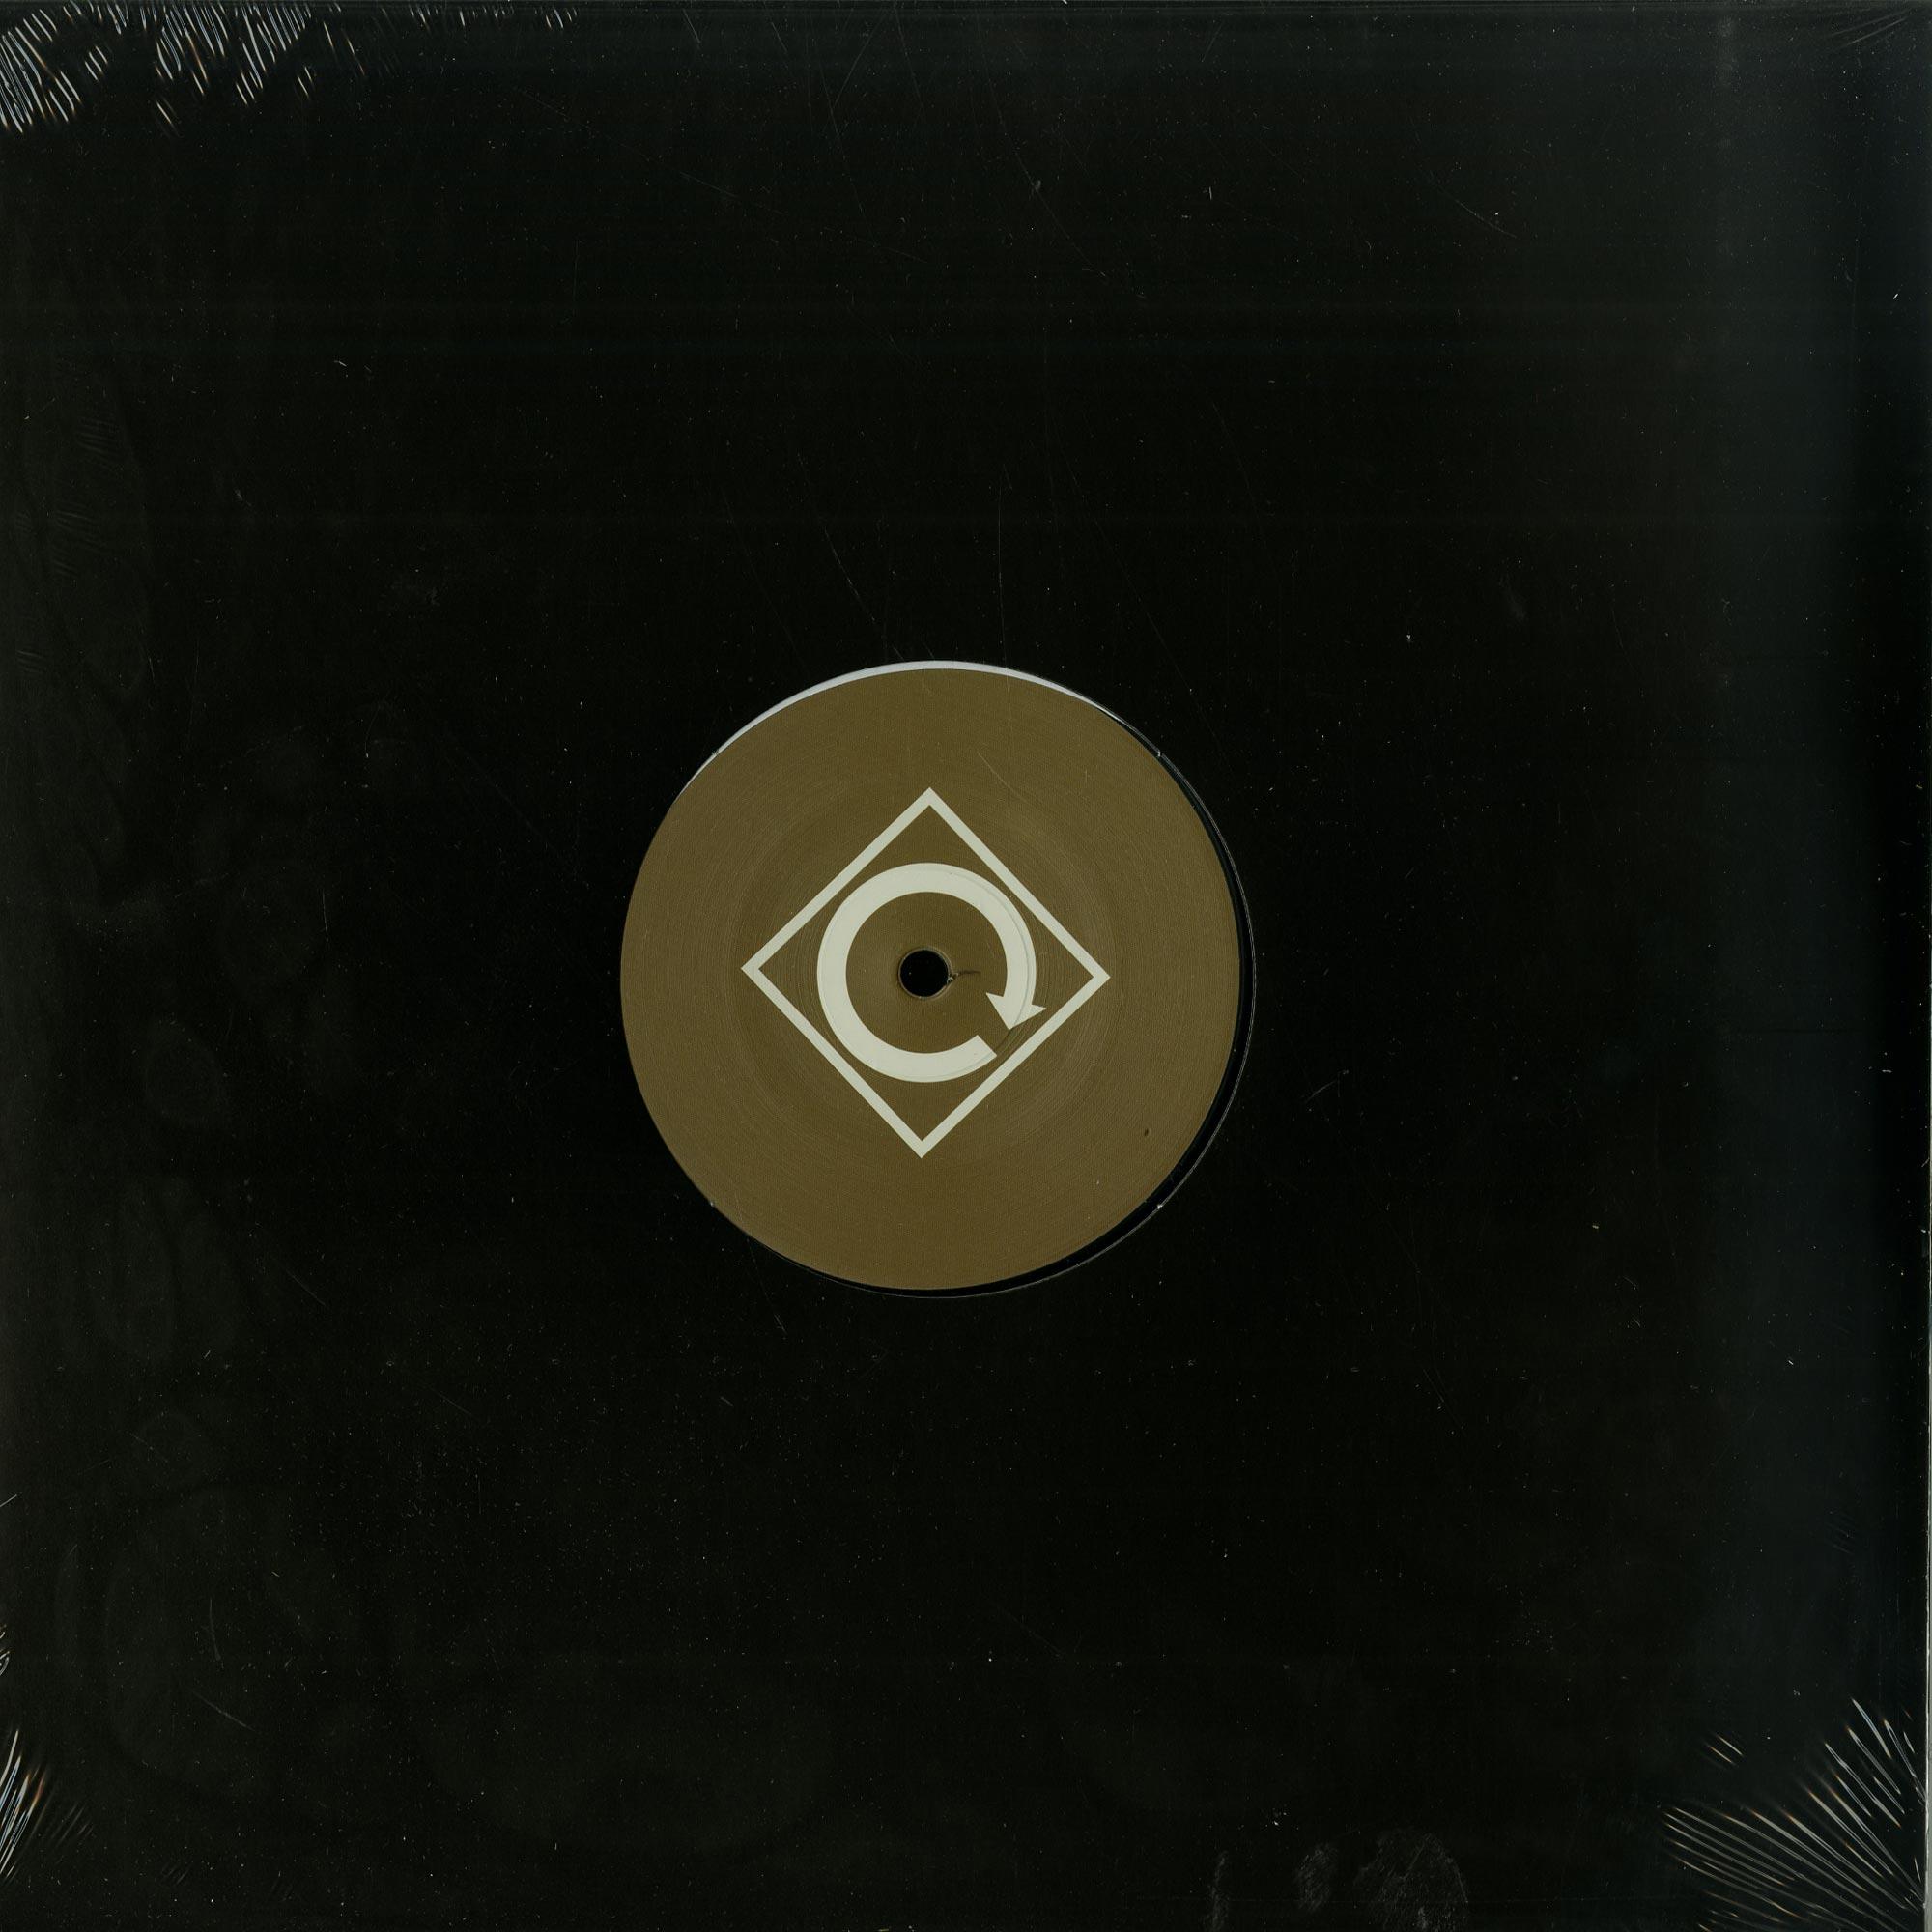 Regal - ALMA MATER EP